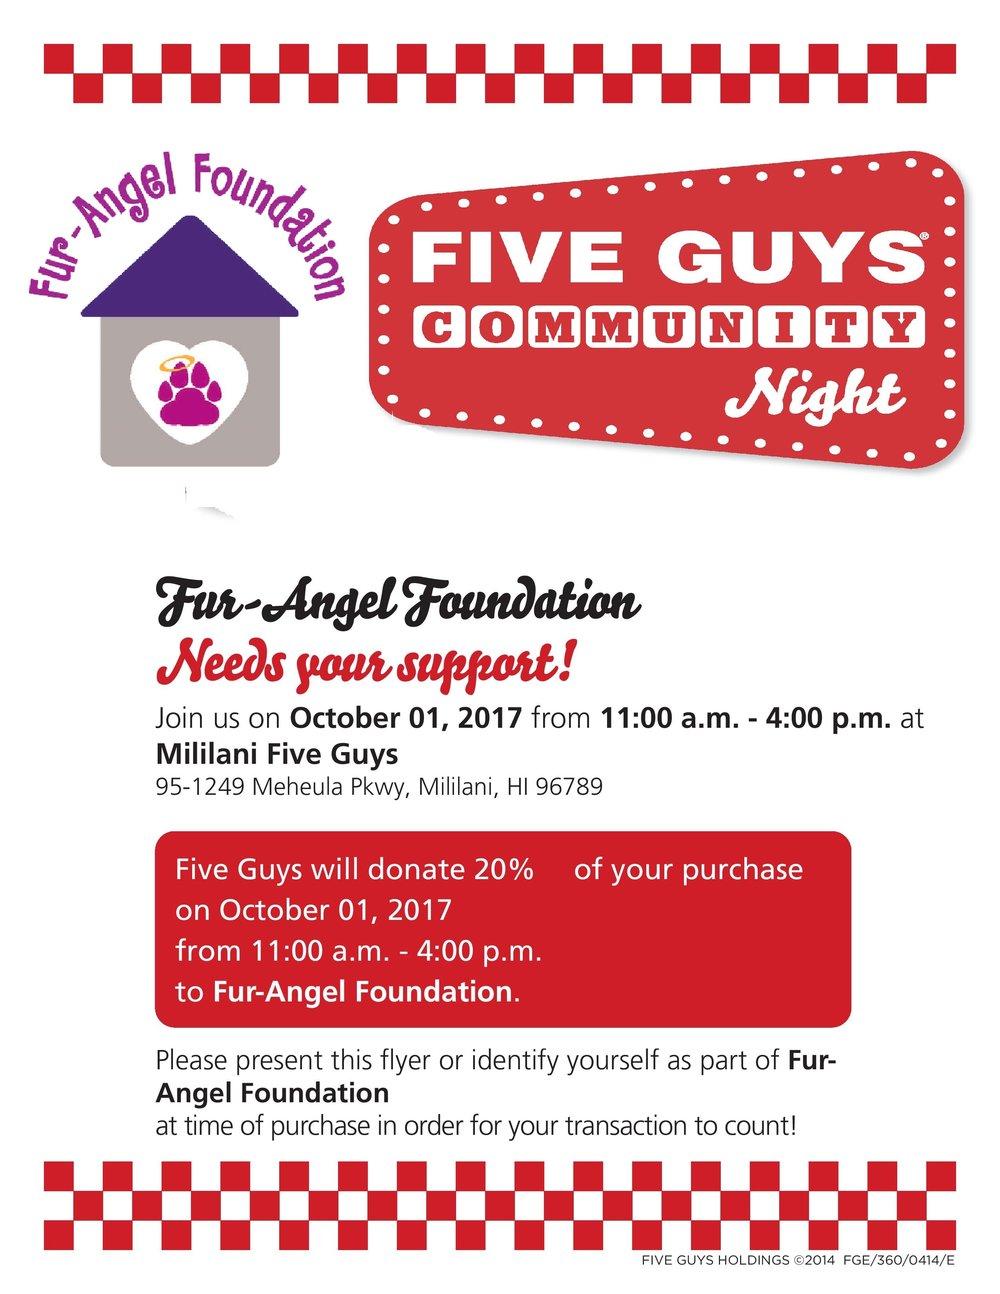 Mililani Fur-Angel Foundation Community Night Flyer.jpg